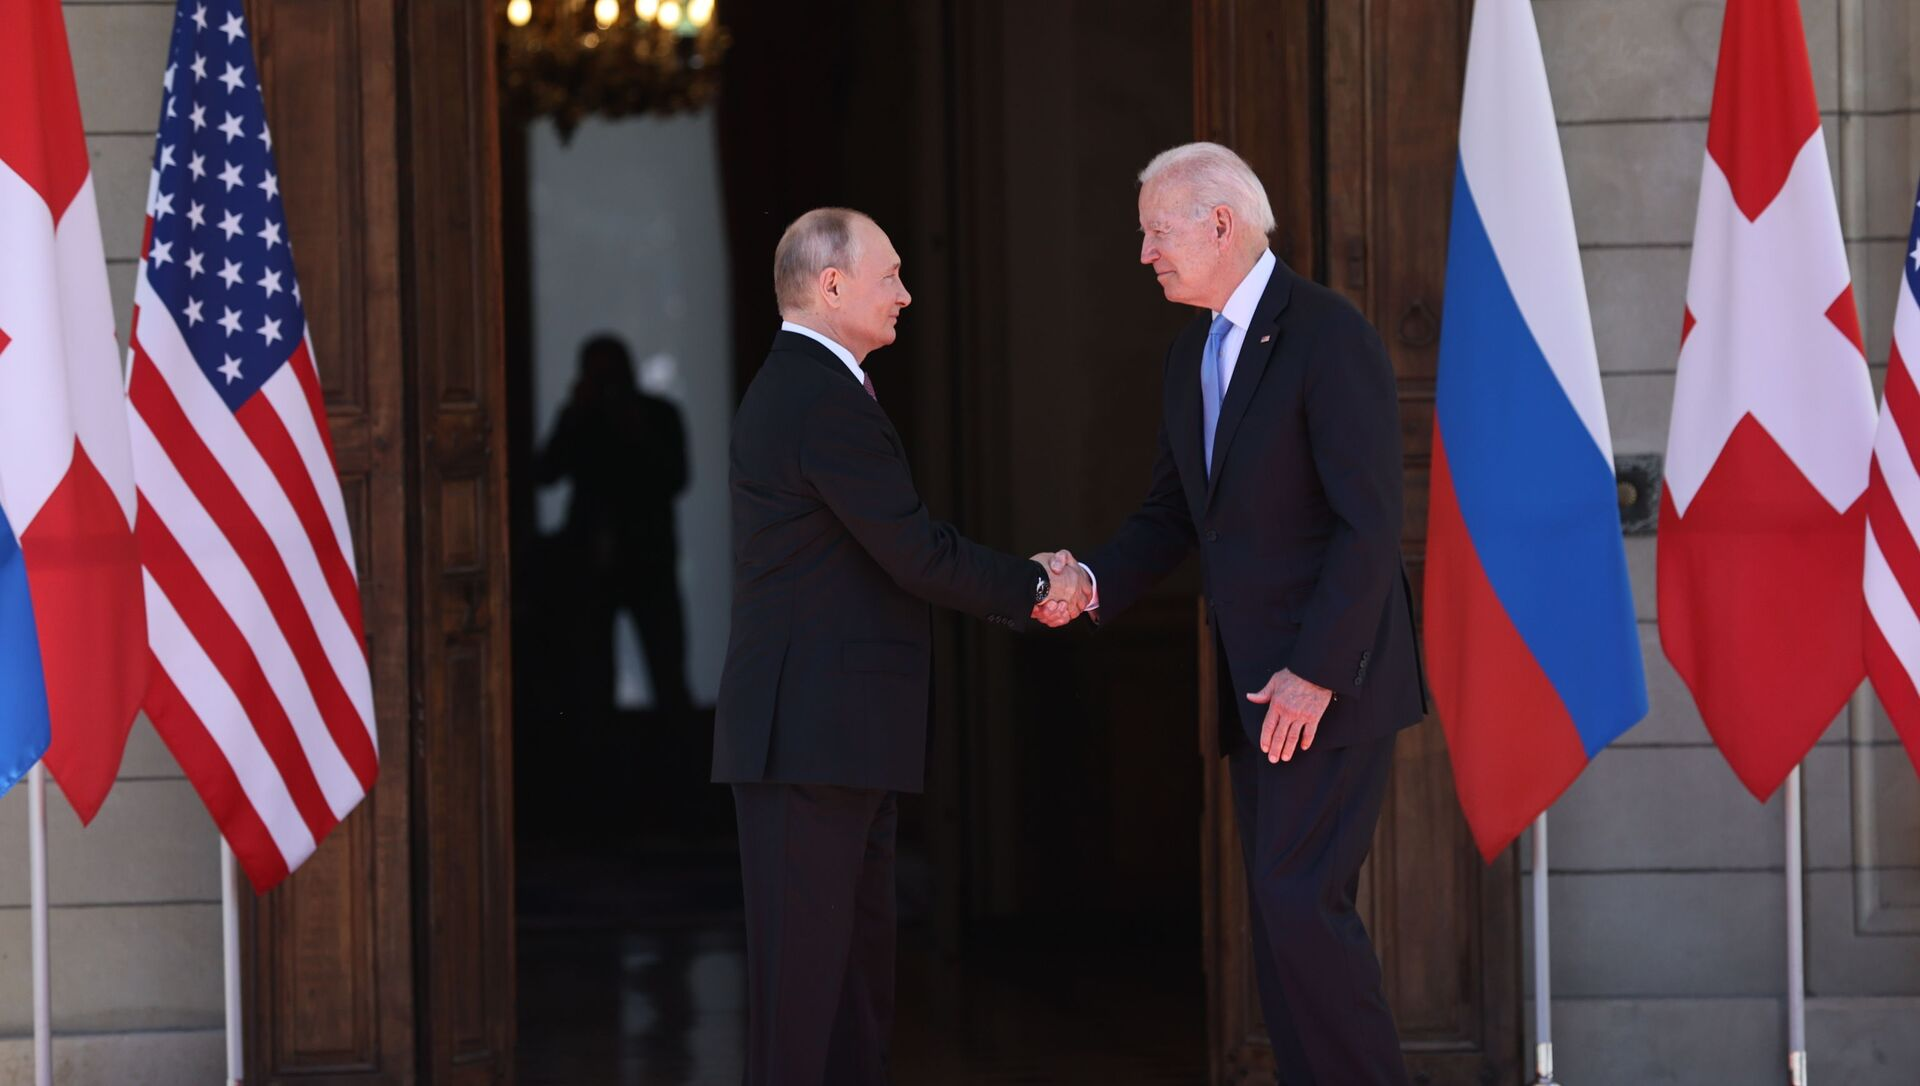 Президент РФ Владимир Путин и президент США Джо Байден (справа) во время встречи в Женеве на вилле Ла Гранж. 16 июня 2021. - Sputnik Азербайджан, 1920, 27.07.2021